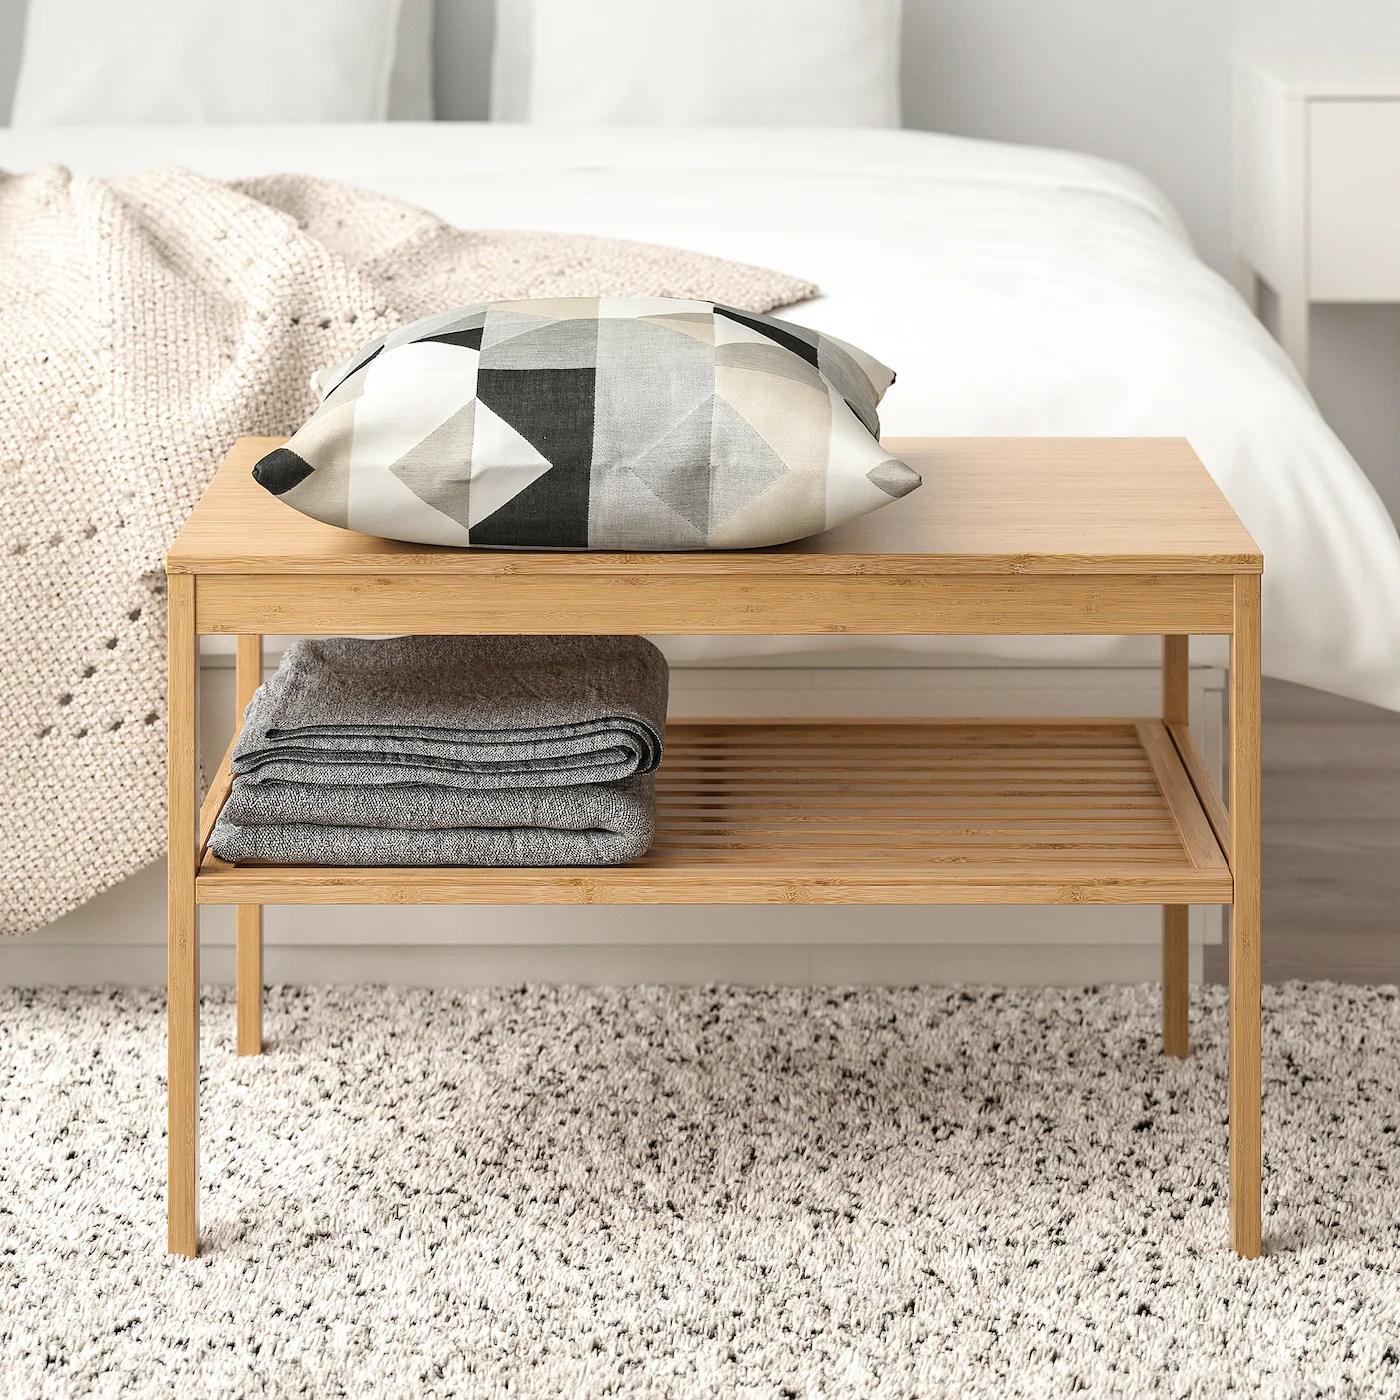 Nordkisa Banc Bambou Materiau Durable Ikea